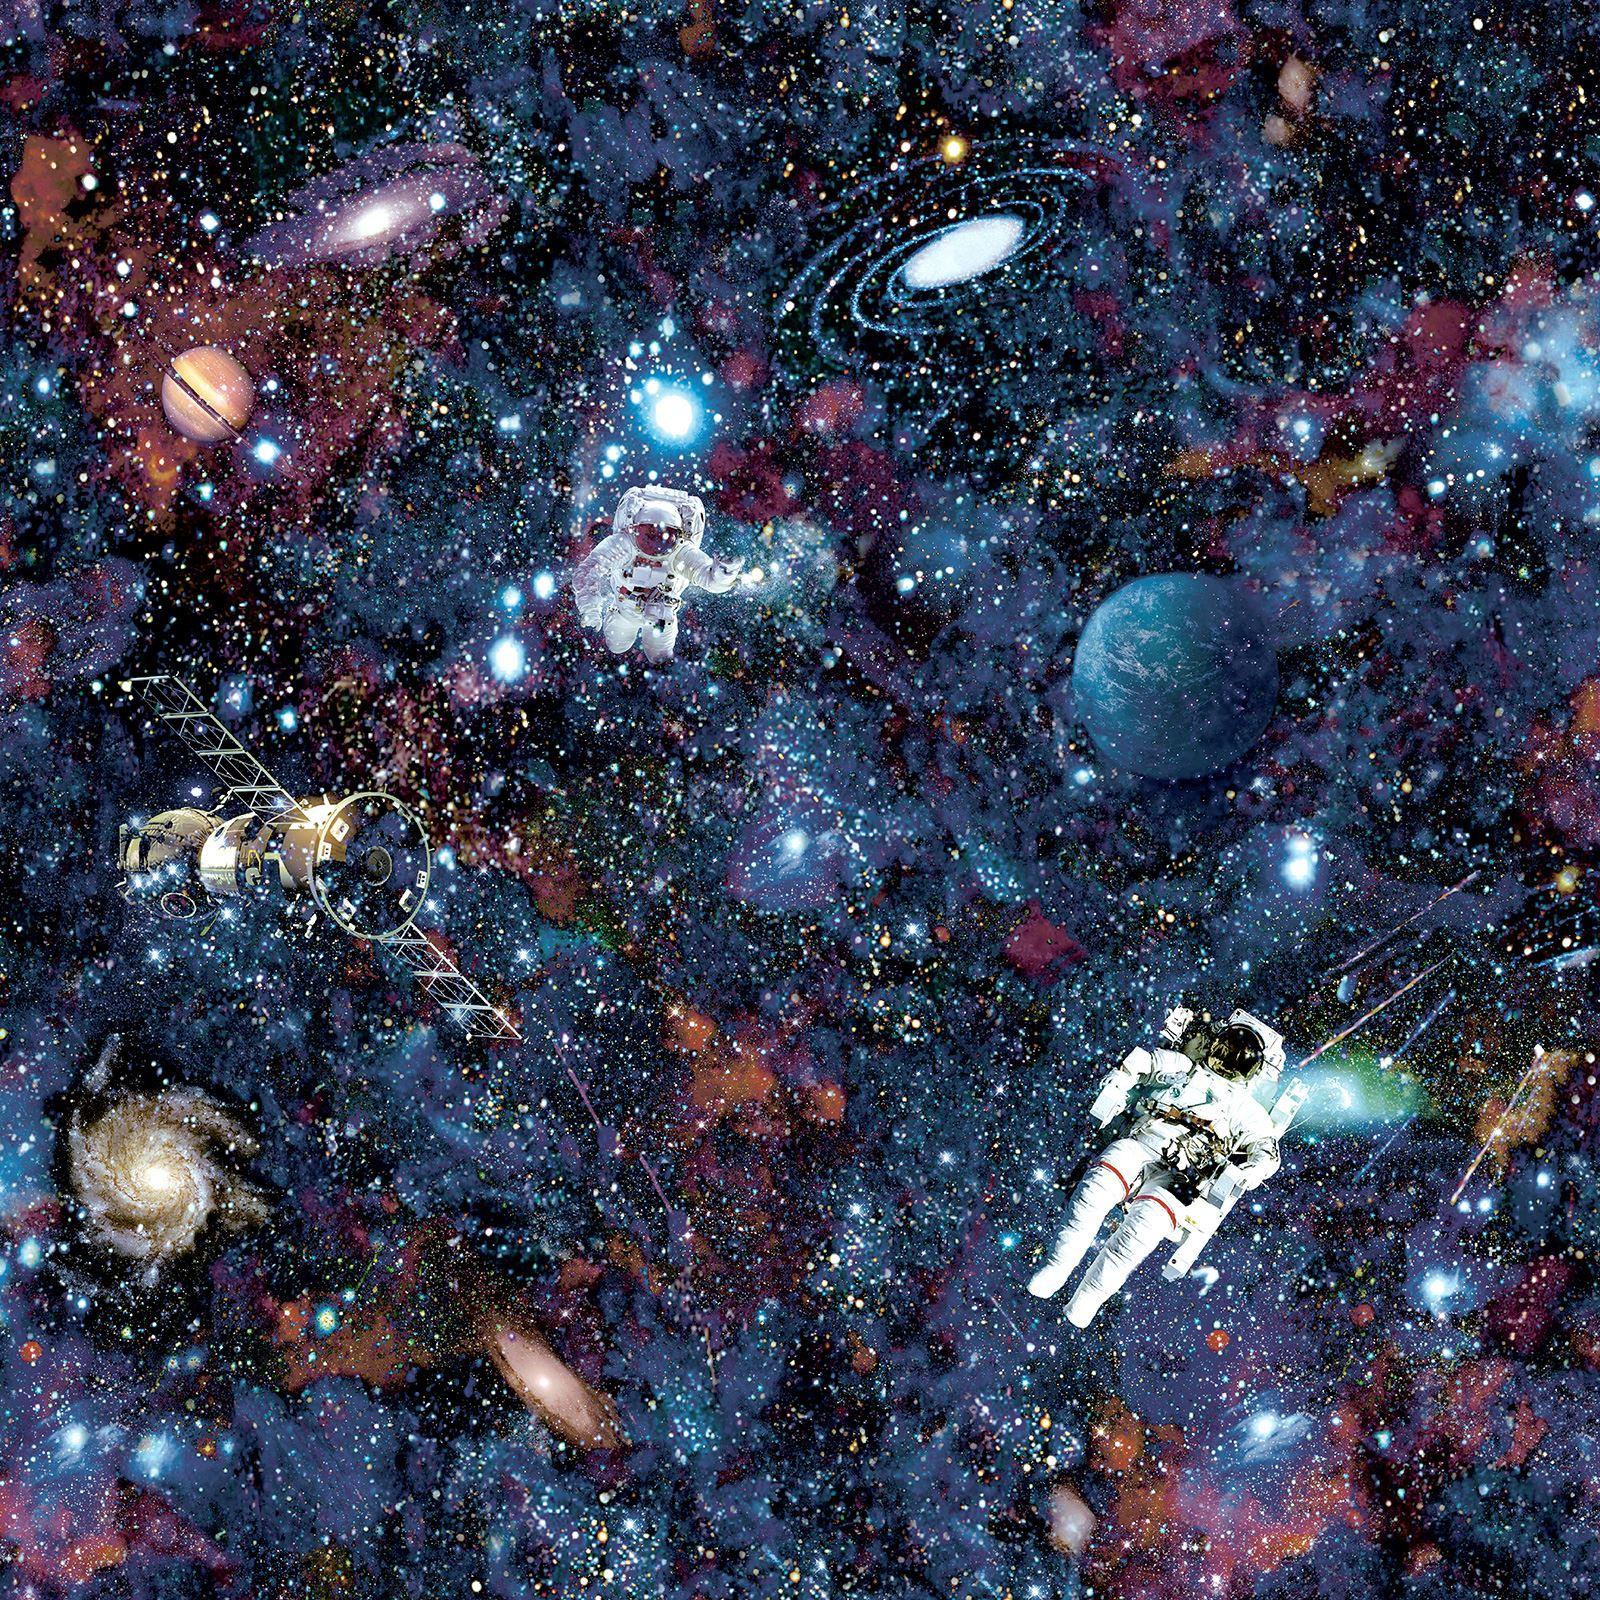 Wallpaper Space: KIDS BOYS WALLPAPER CARS SPACE FOOTBALL GRAFFITI CHILDRENS